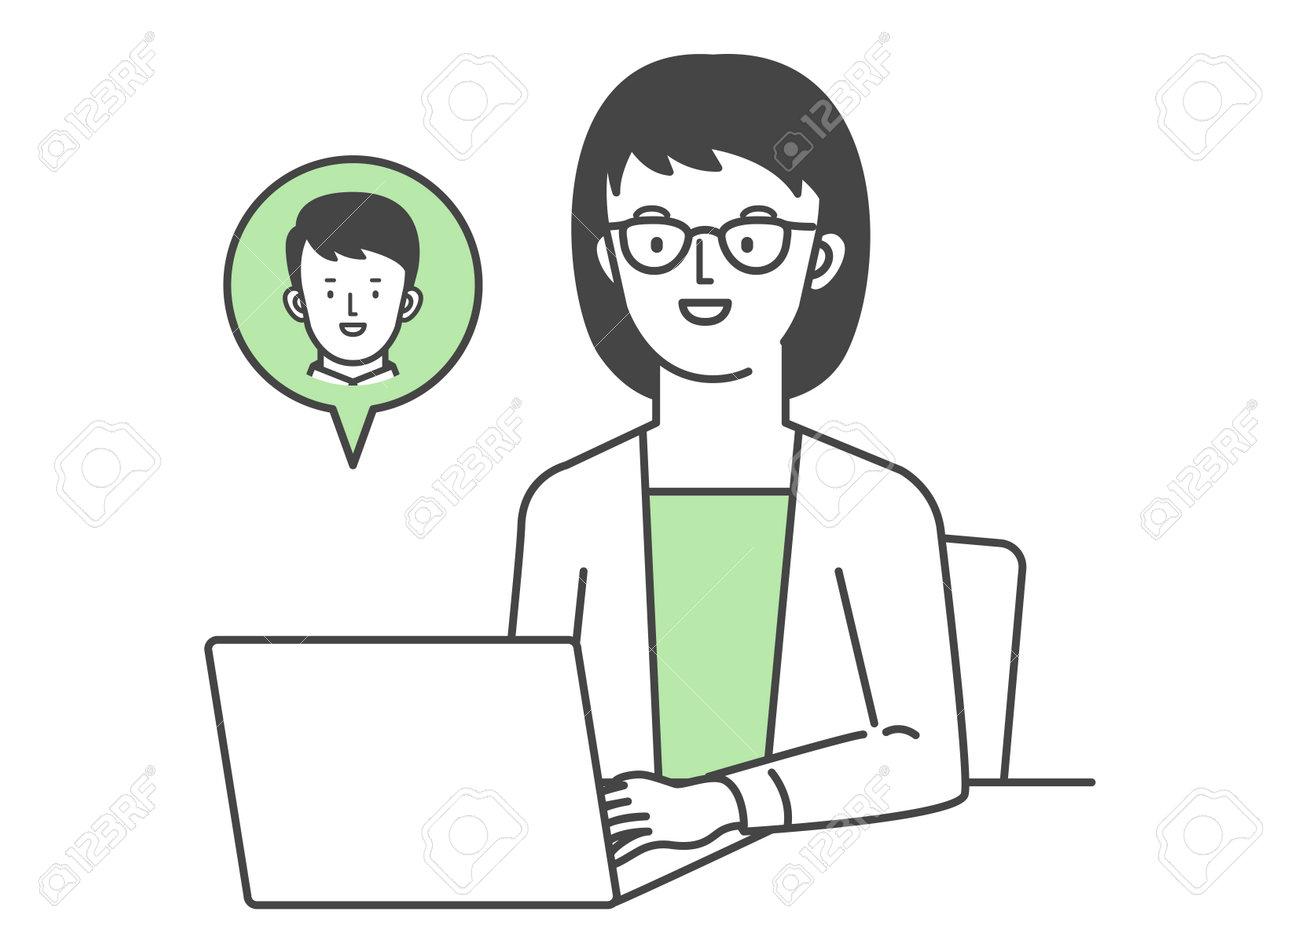 Illustration illustration of businessman making online call Illustration of a businessman making an online call. - 171029801